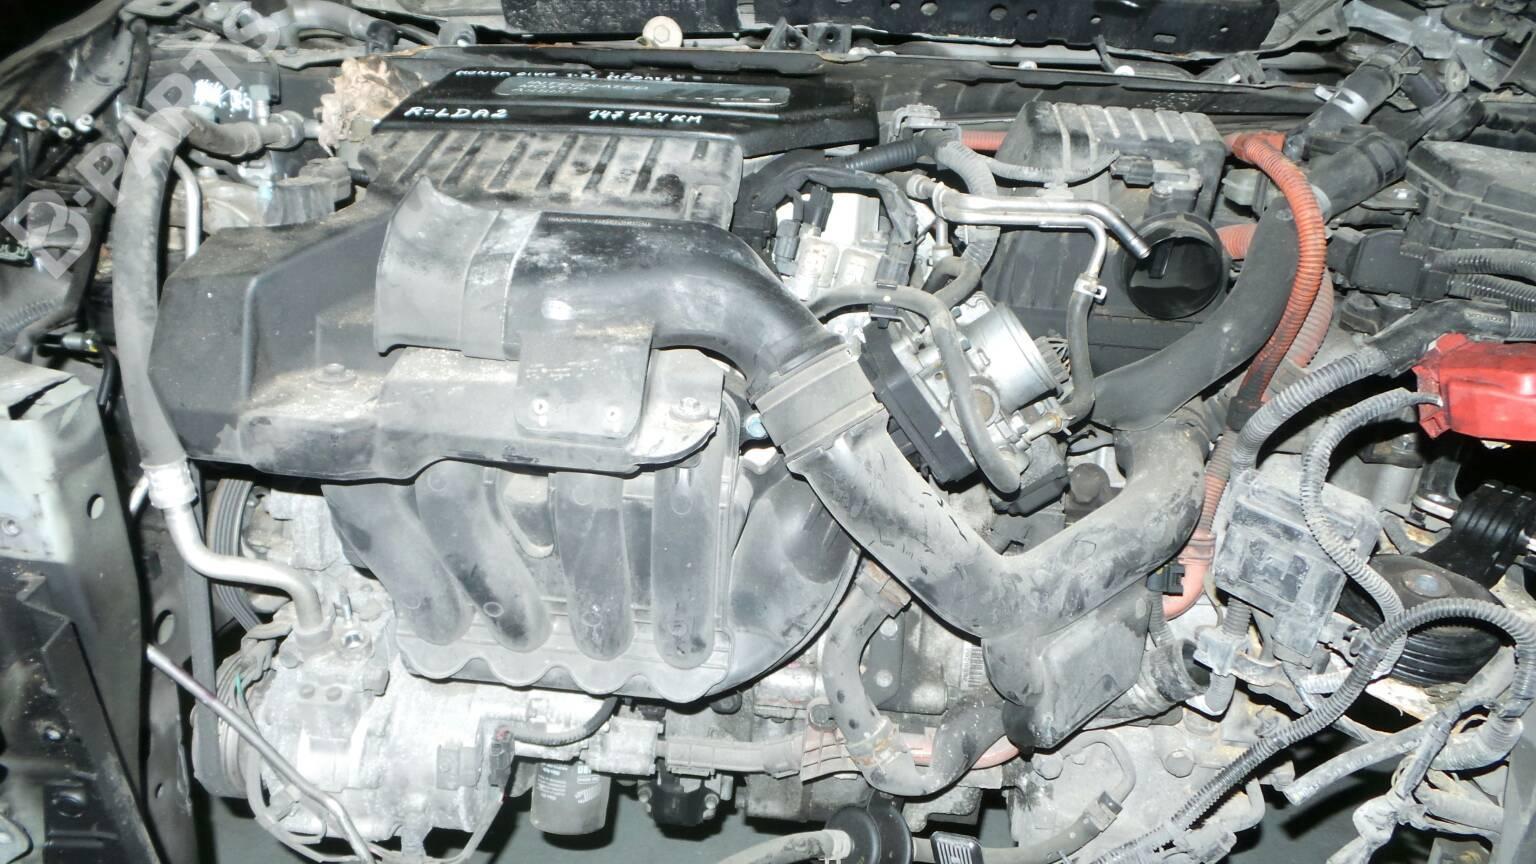 Engine Honda Civic Viii Saloon Fd Fa 13 Hybrid 37022 2006 Complete 2025370 95hp